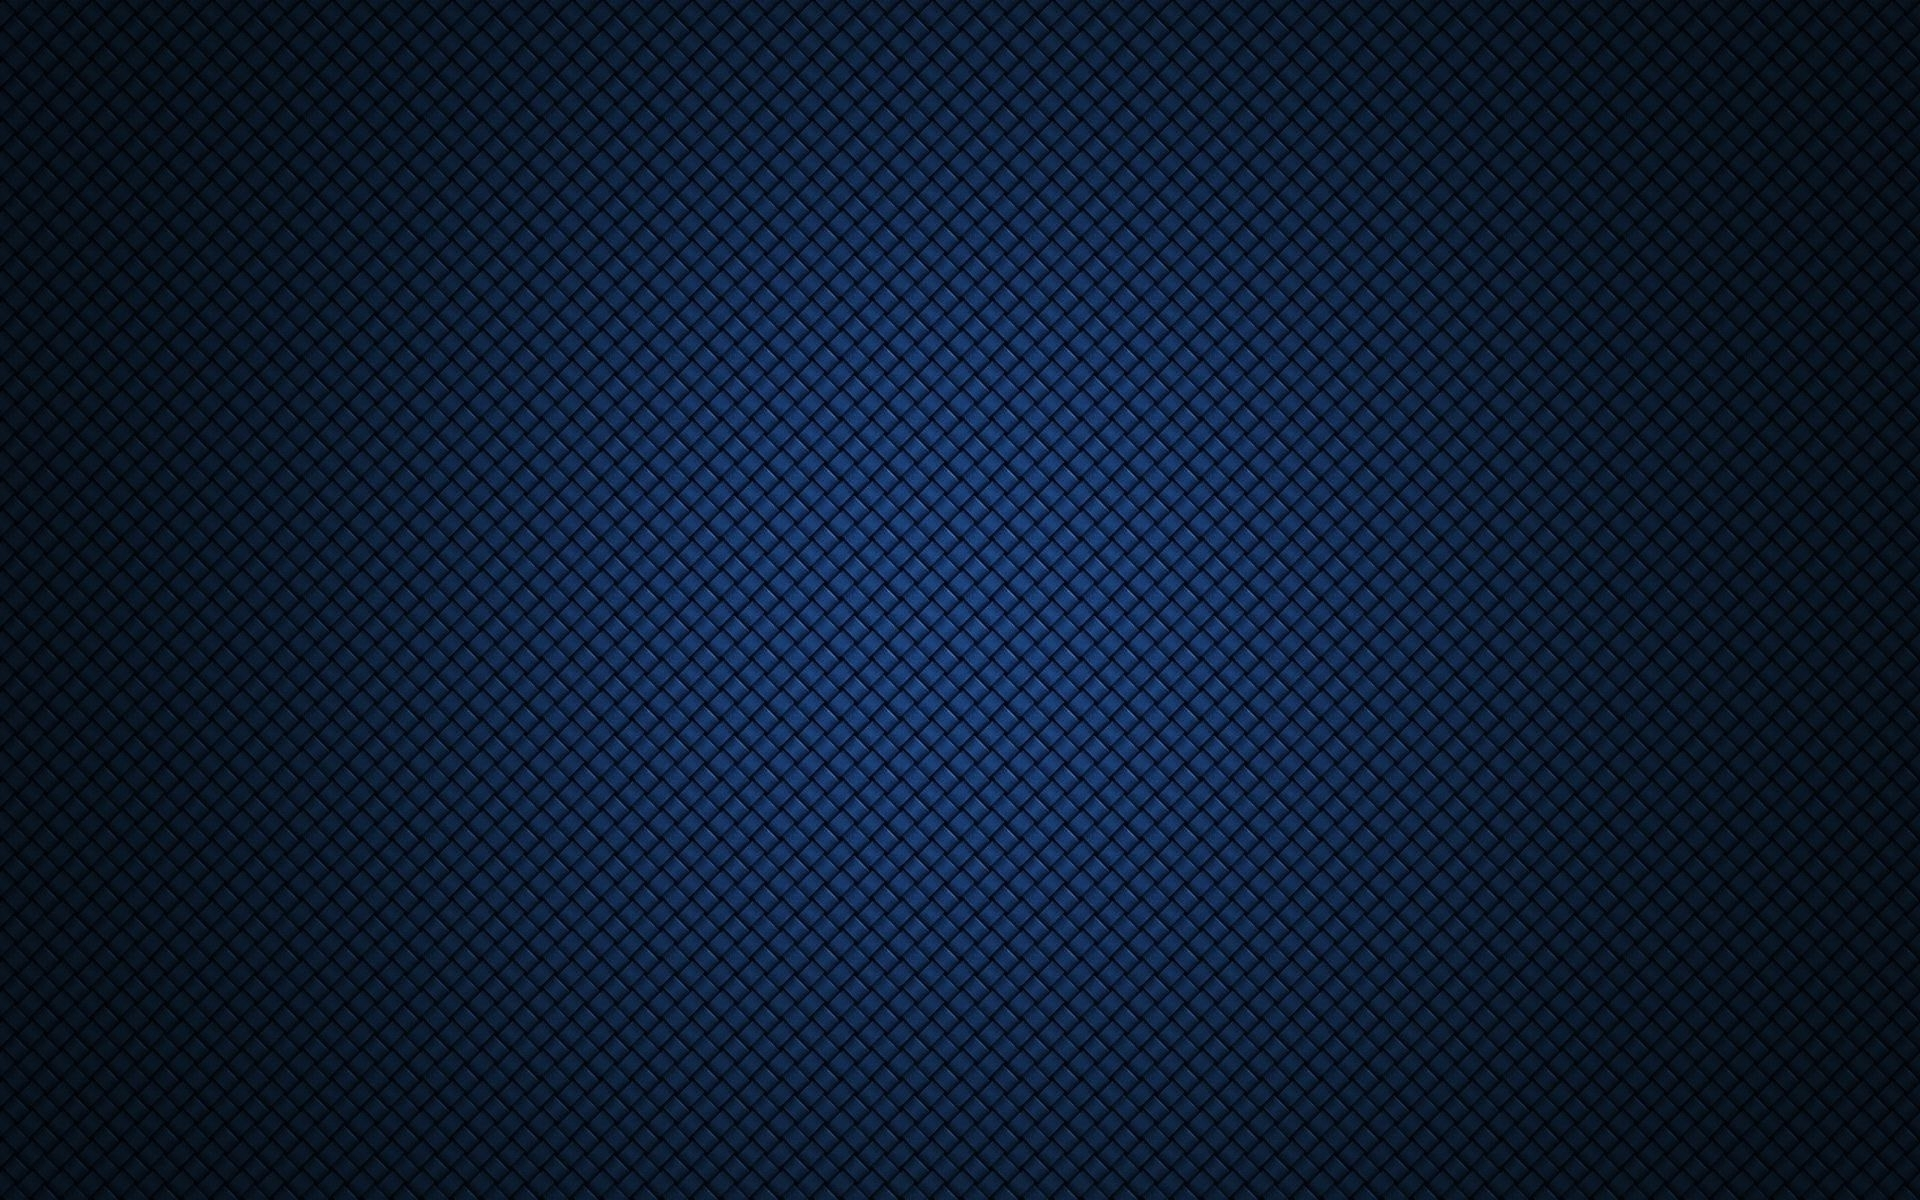 navy blue wallpaper (56+ images)